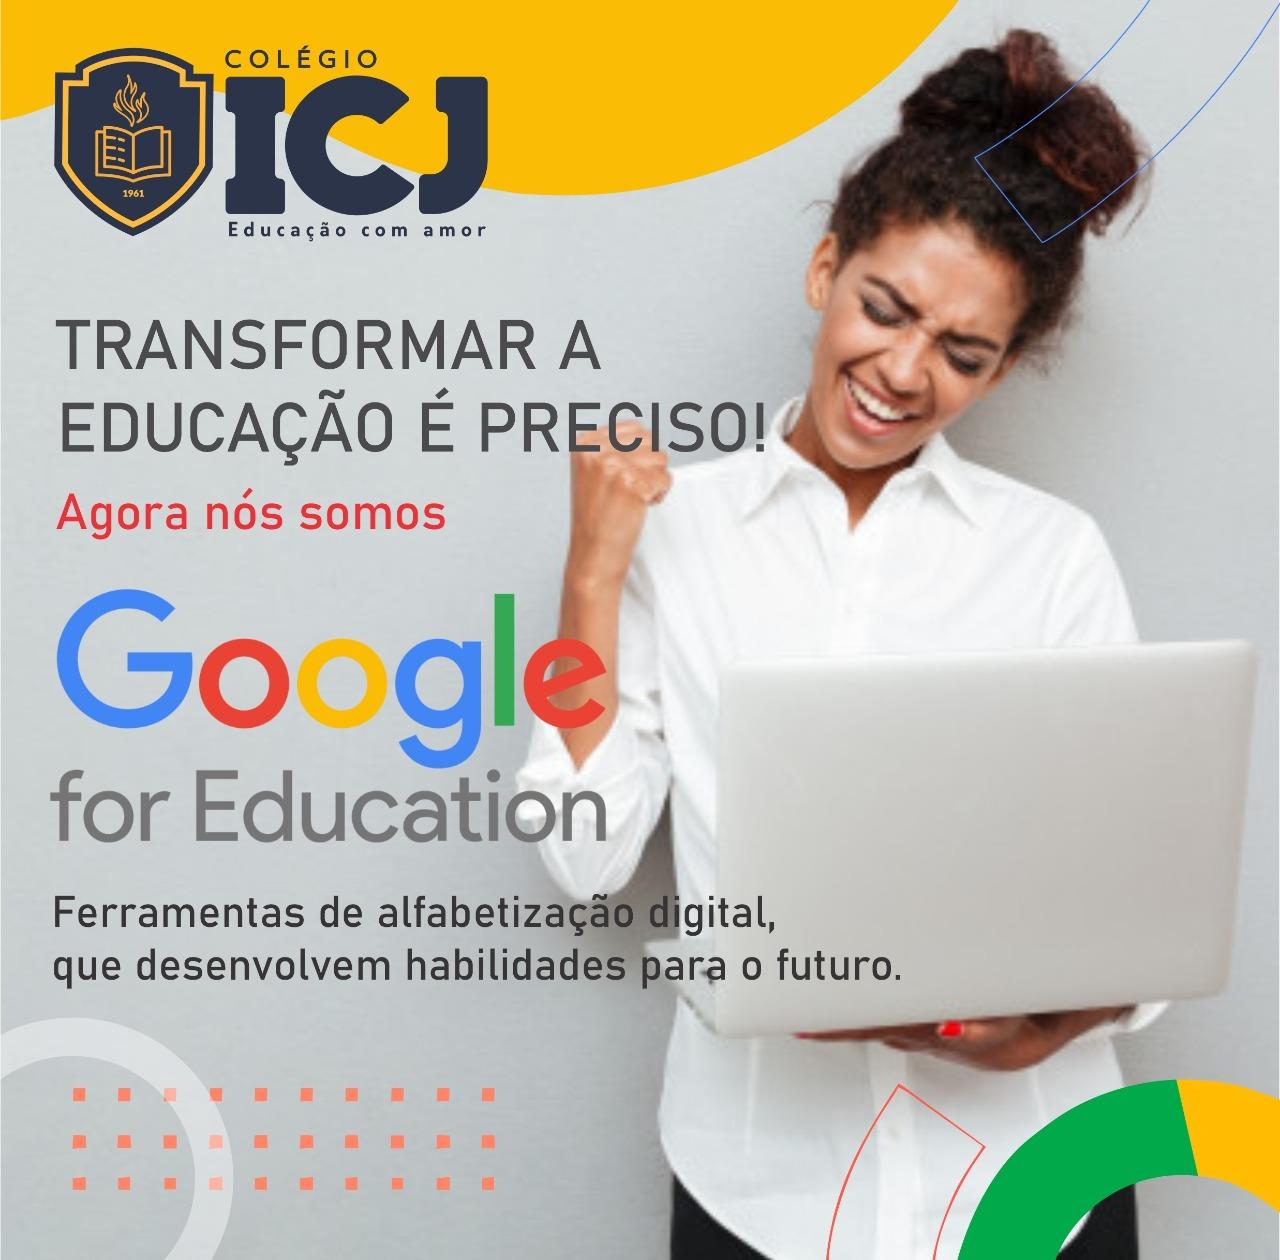 Colégio ICJ adota Google for Education